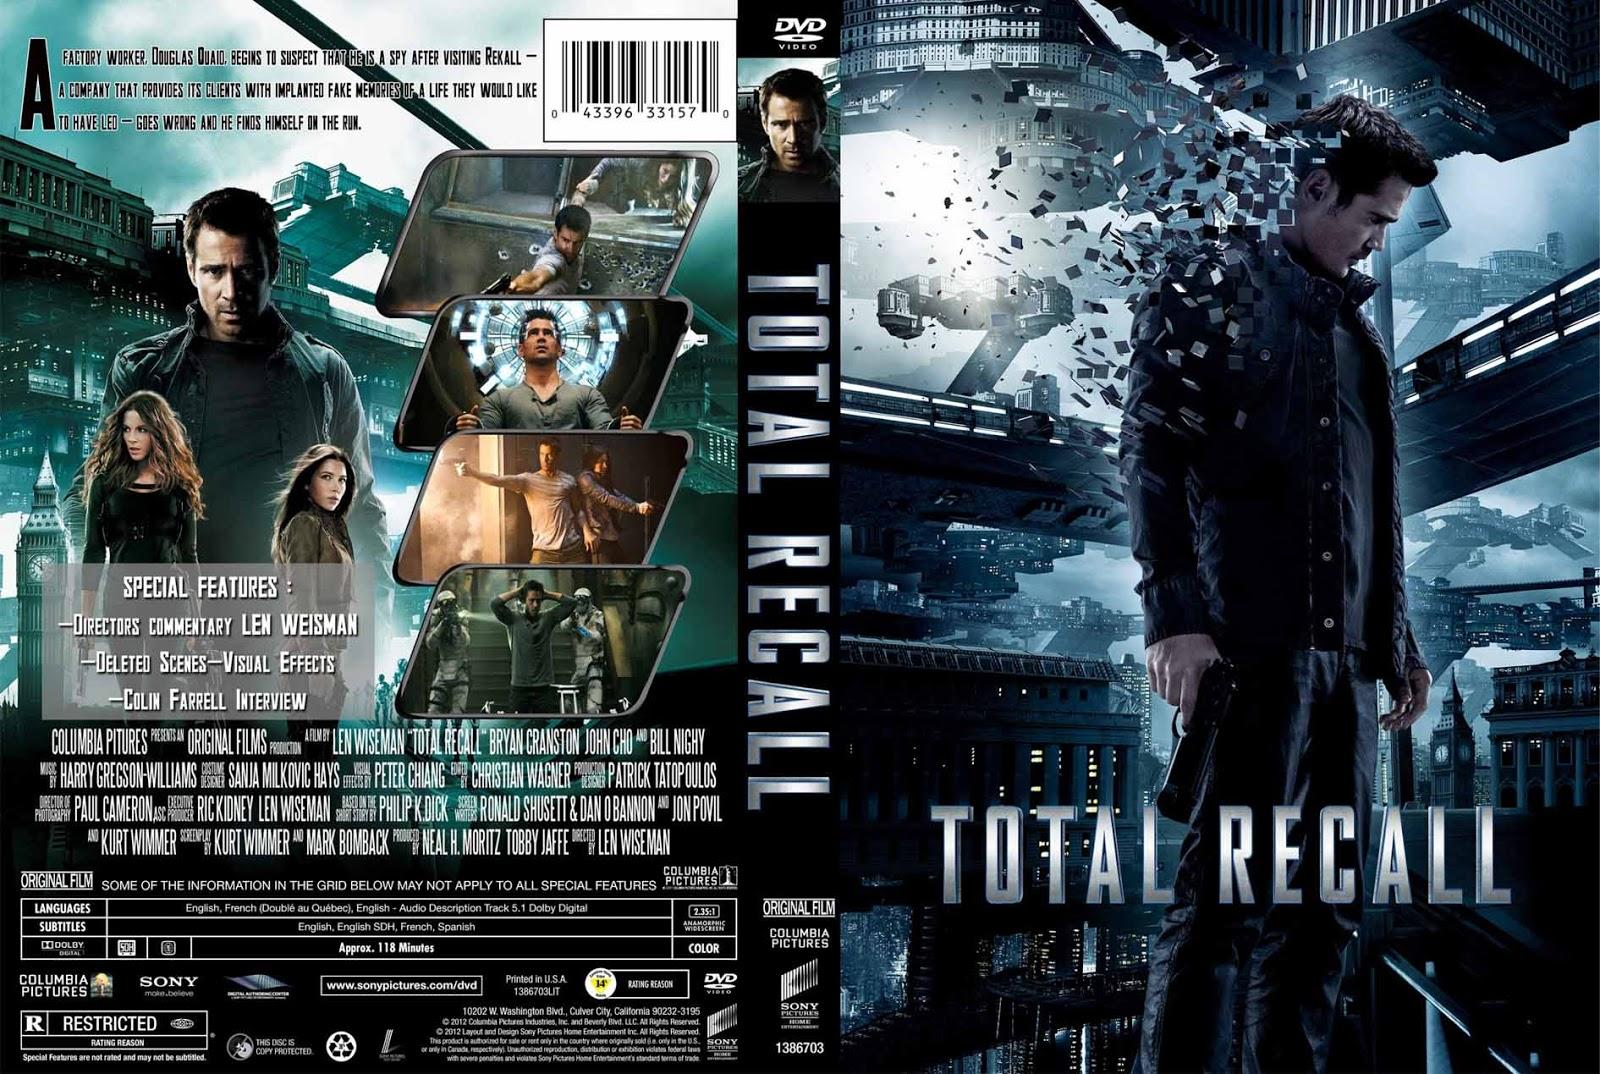 2012 movie cover - photo #6